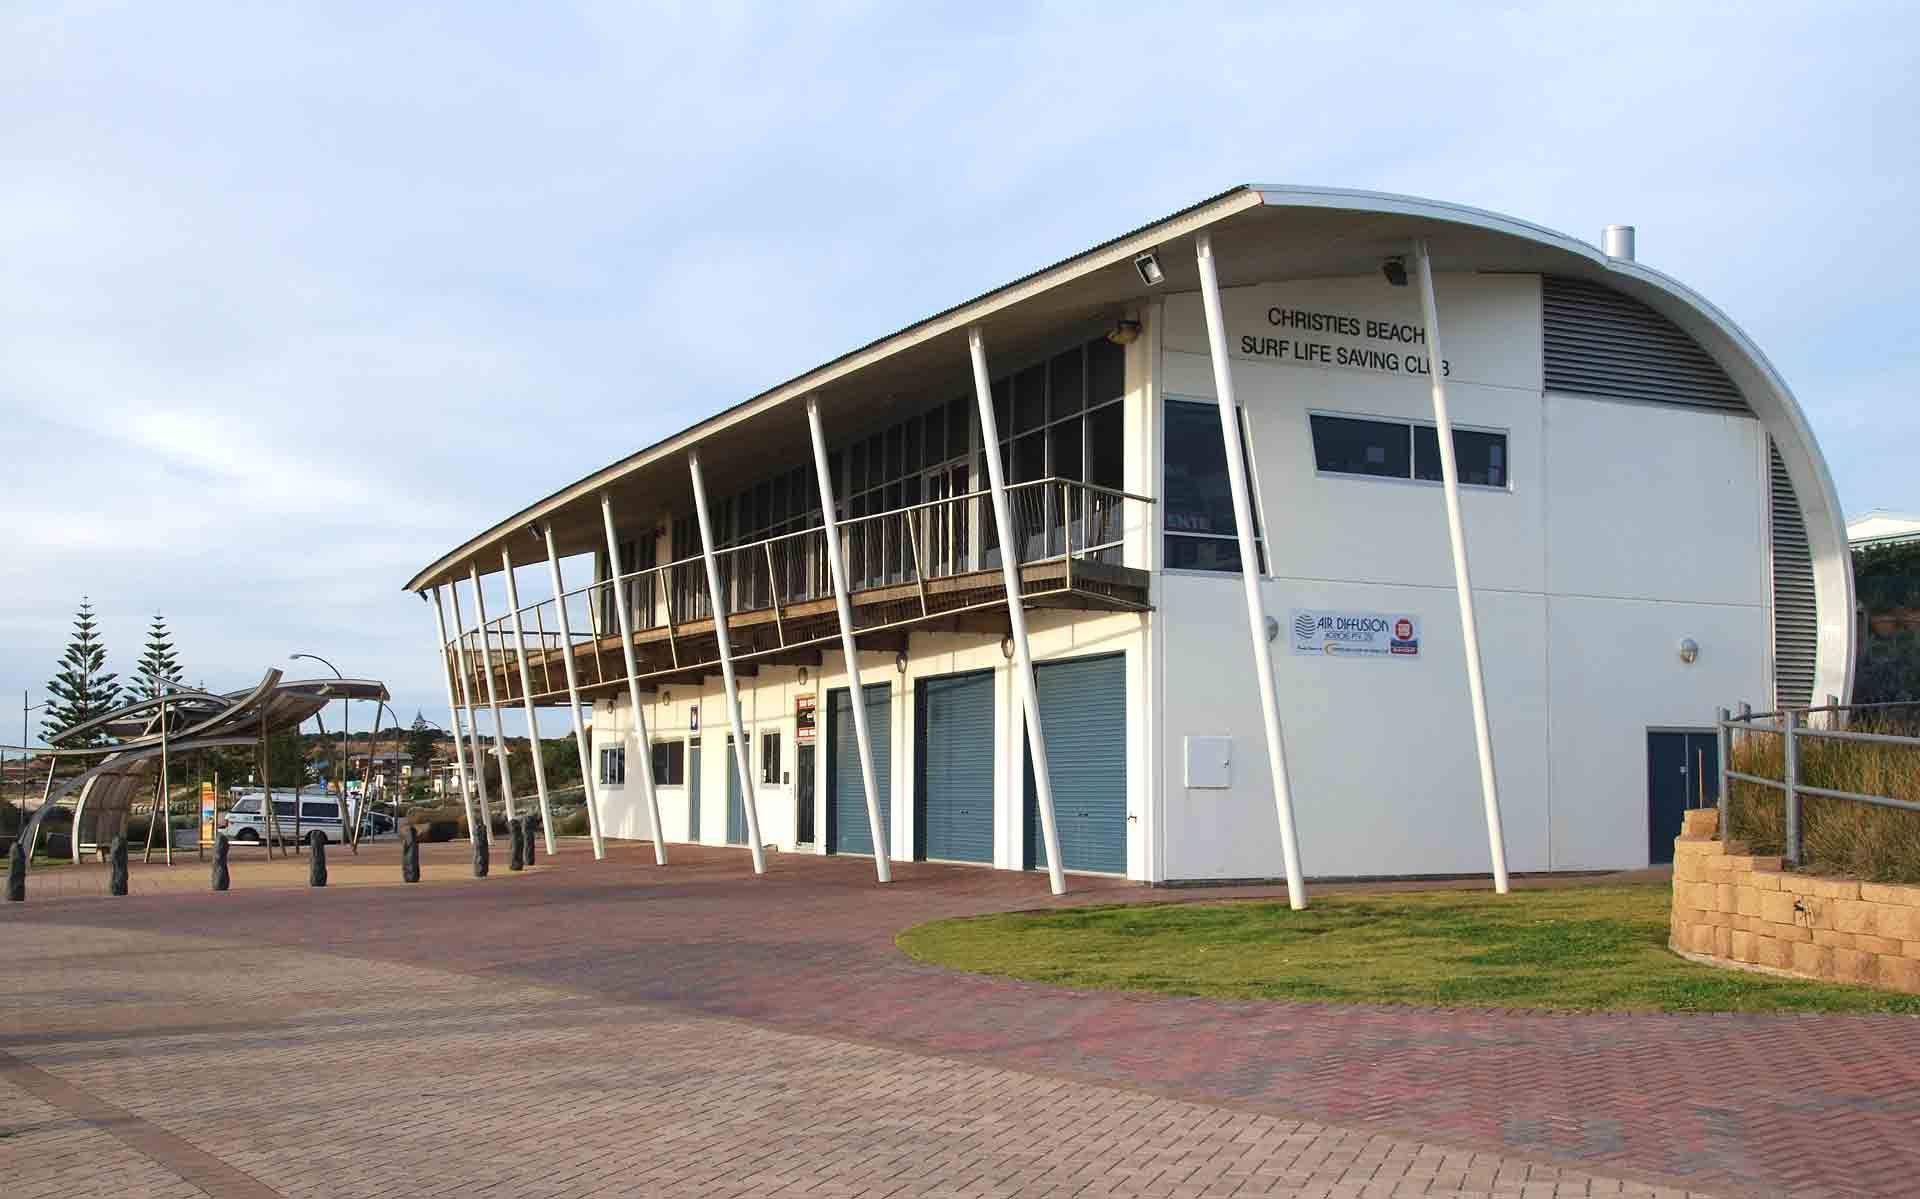 Sneak Peek Backyard At Bondi Bondi Life - Christies beach surf life saving club